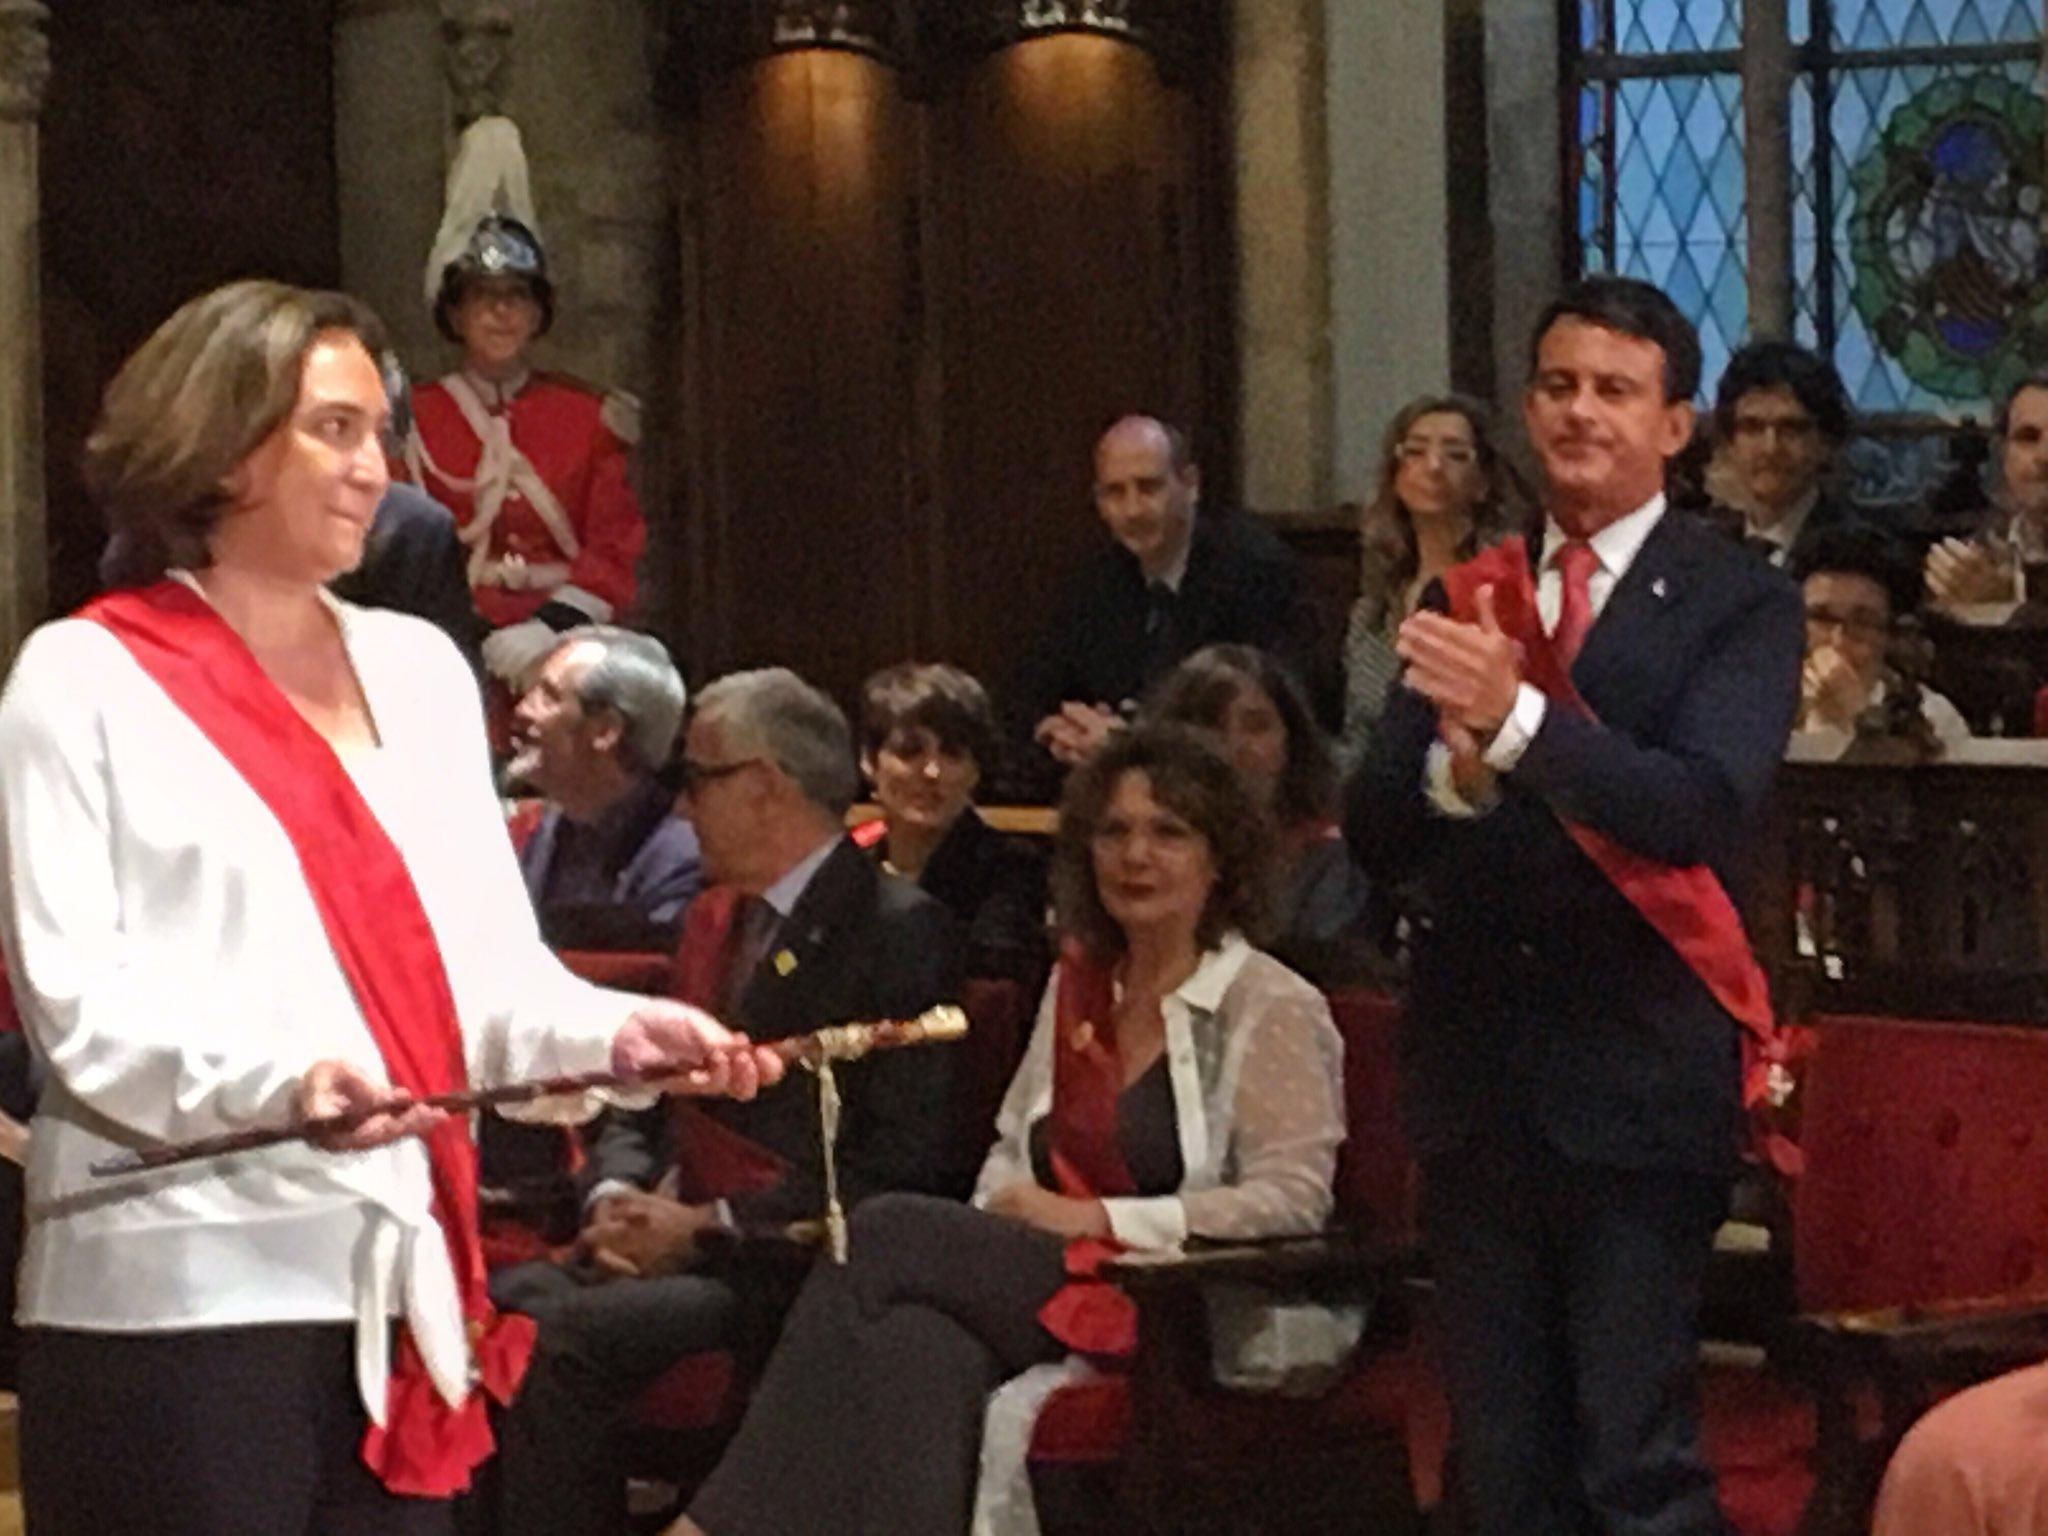 independance de la Catalogne ada colau manuel valls